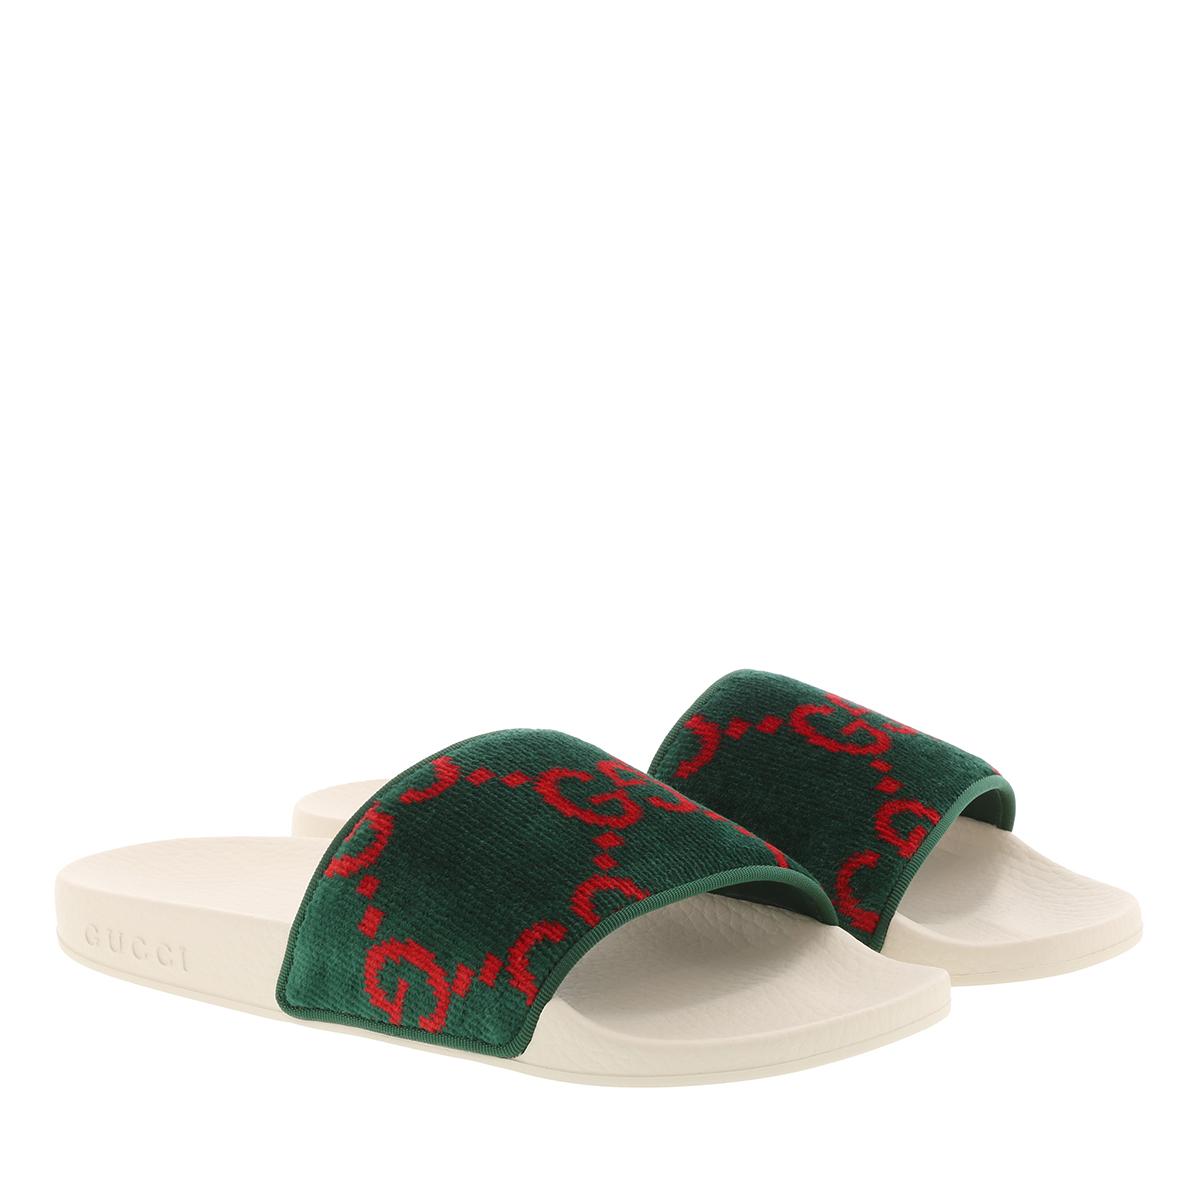 more photos 0e228 12ff1 Gucci Schuhe - GG Slides White/Green - in grün - für Damen